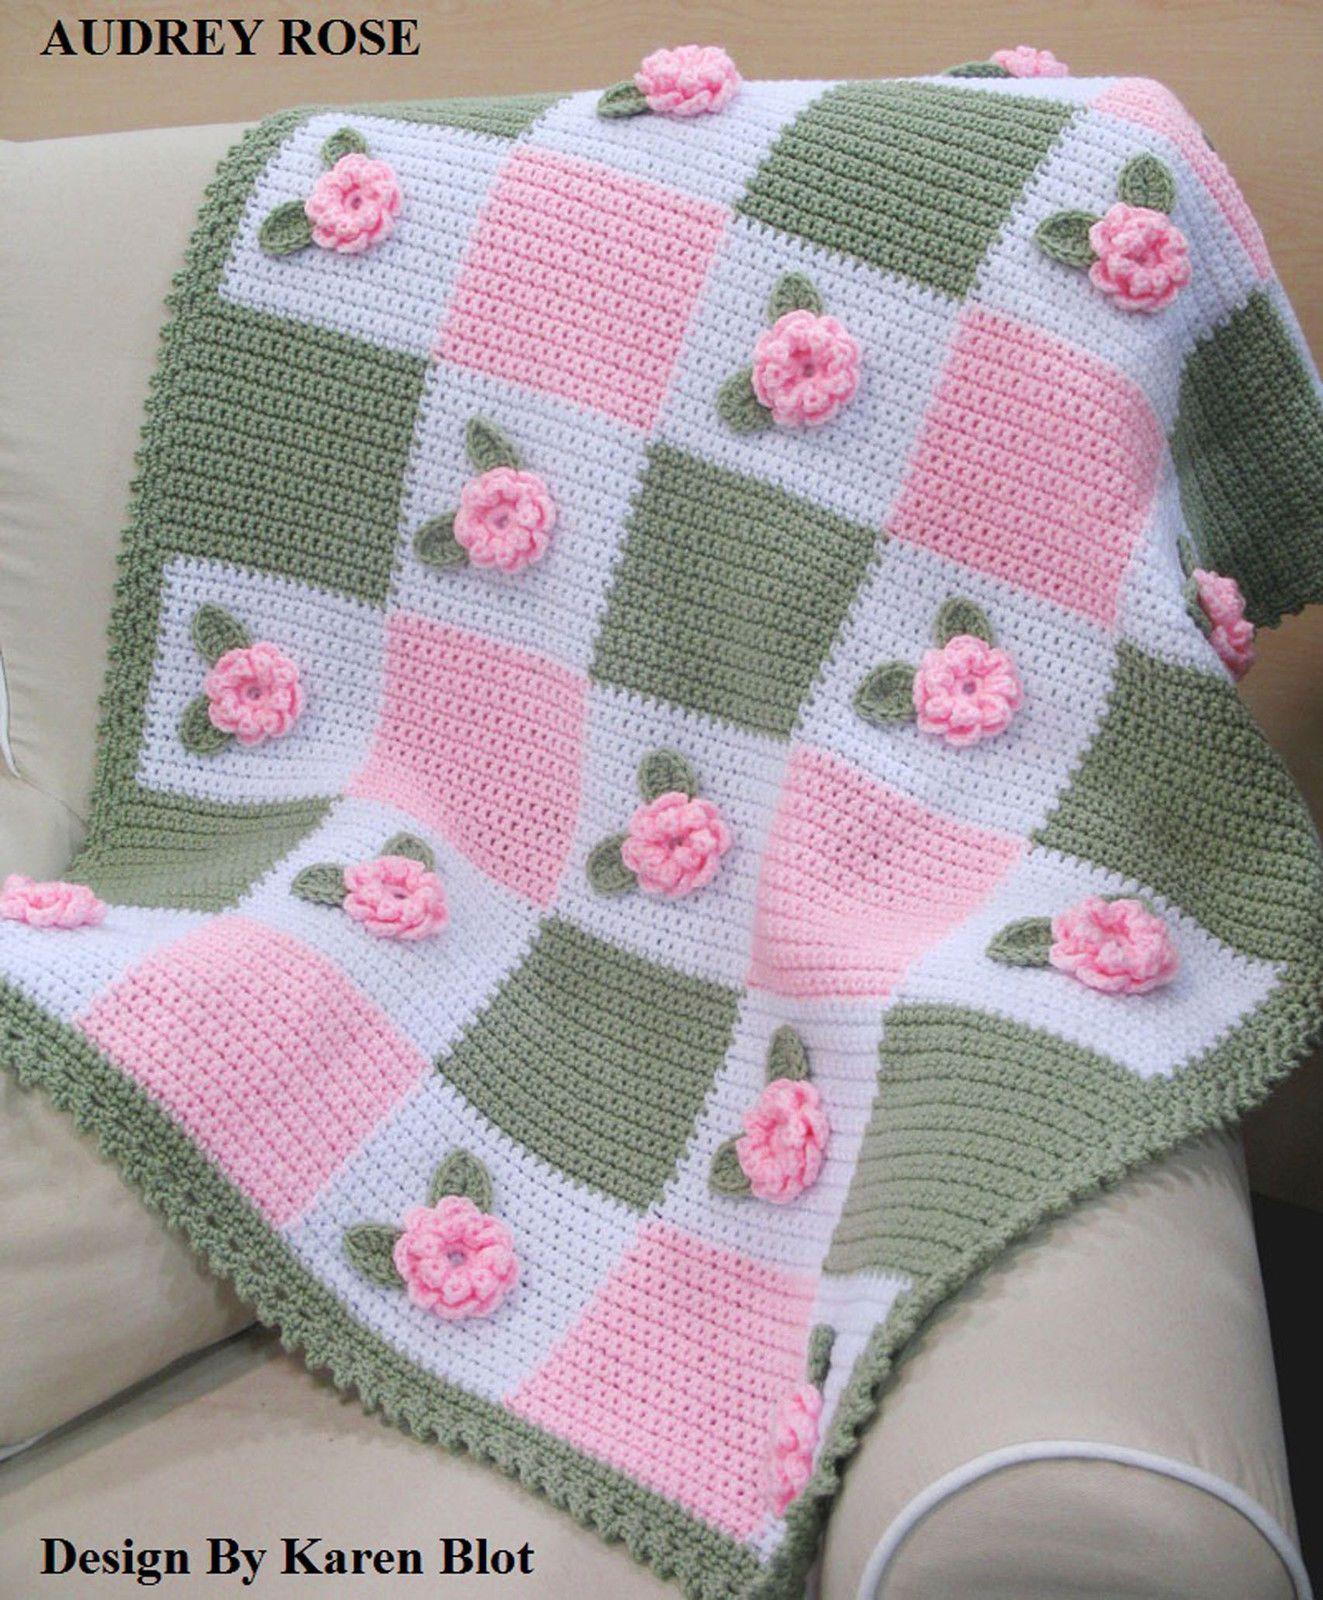 VICTORIAN \'AUDREY ROSE\' Baby Crochet Afghan PATTERN 3-D   Audrey ...